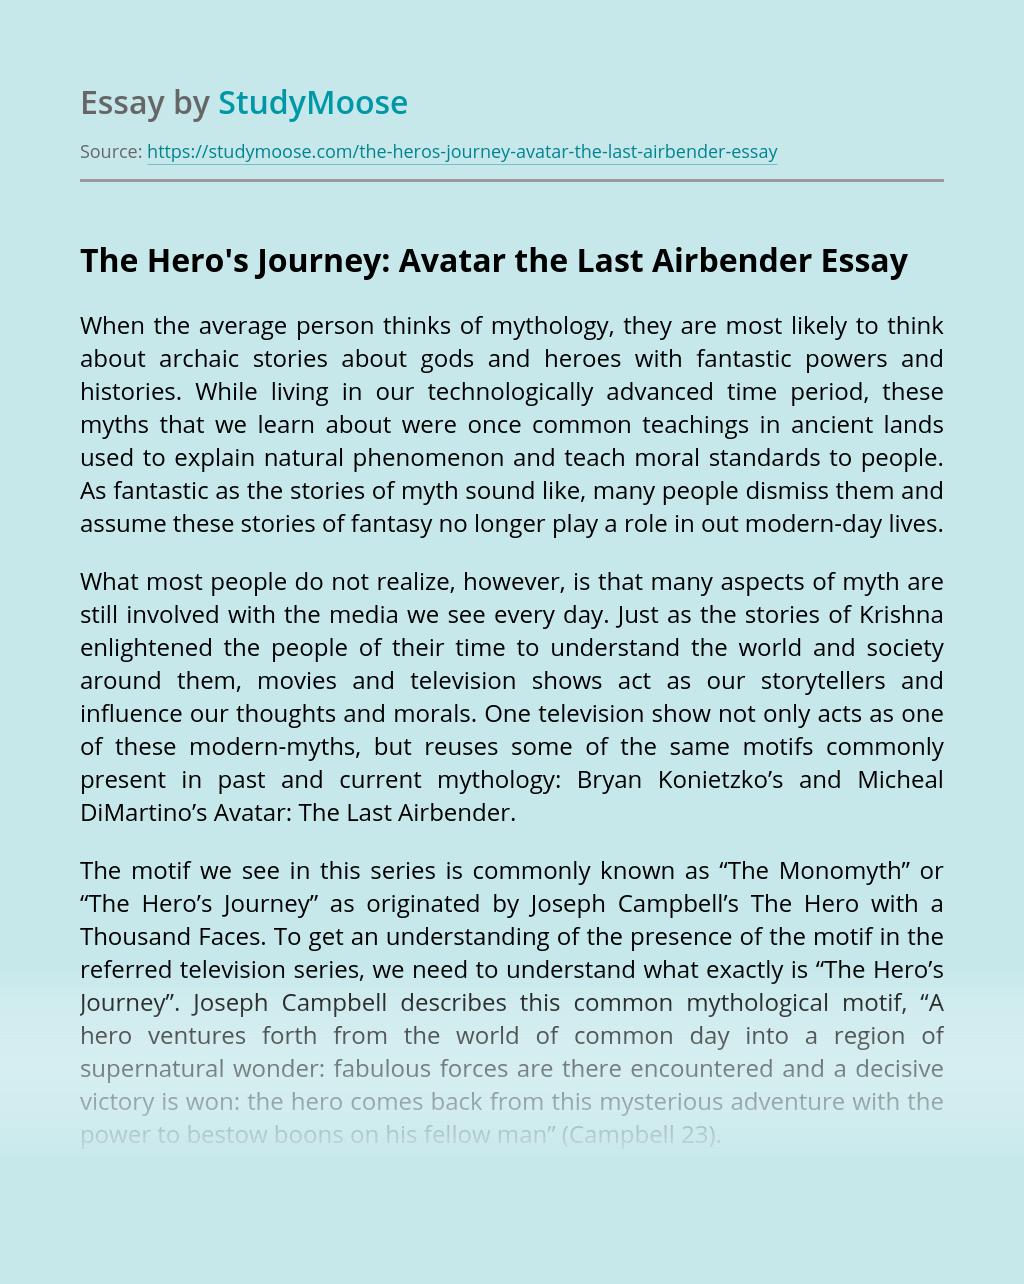 The Hero's Journey: Avatar the Last Airbender